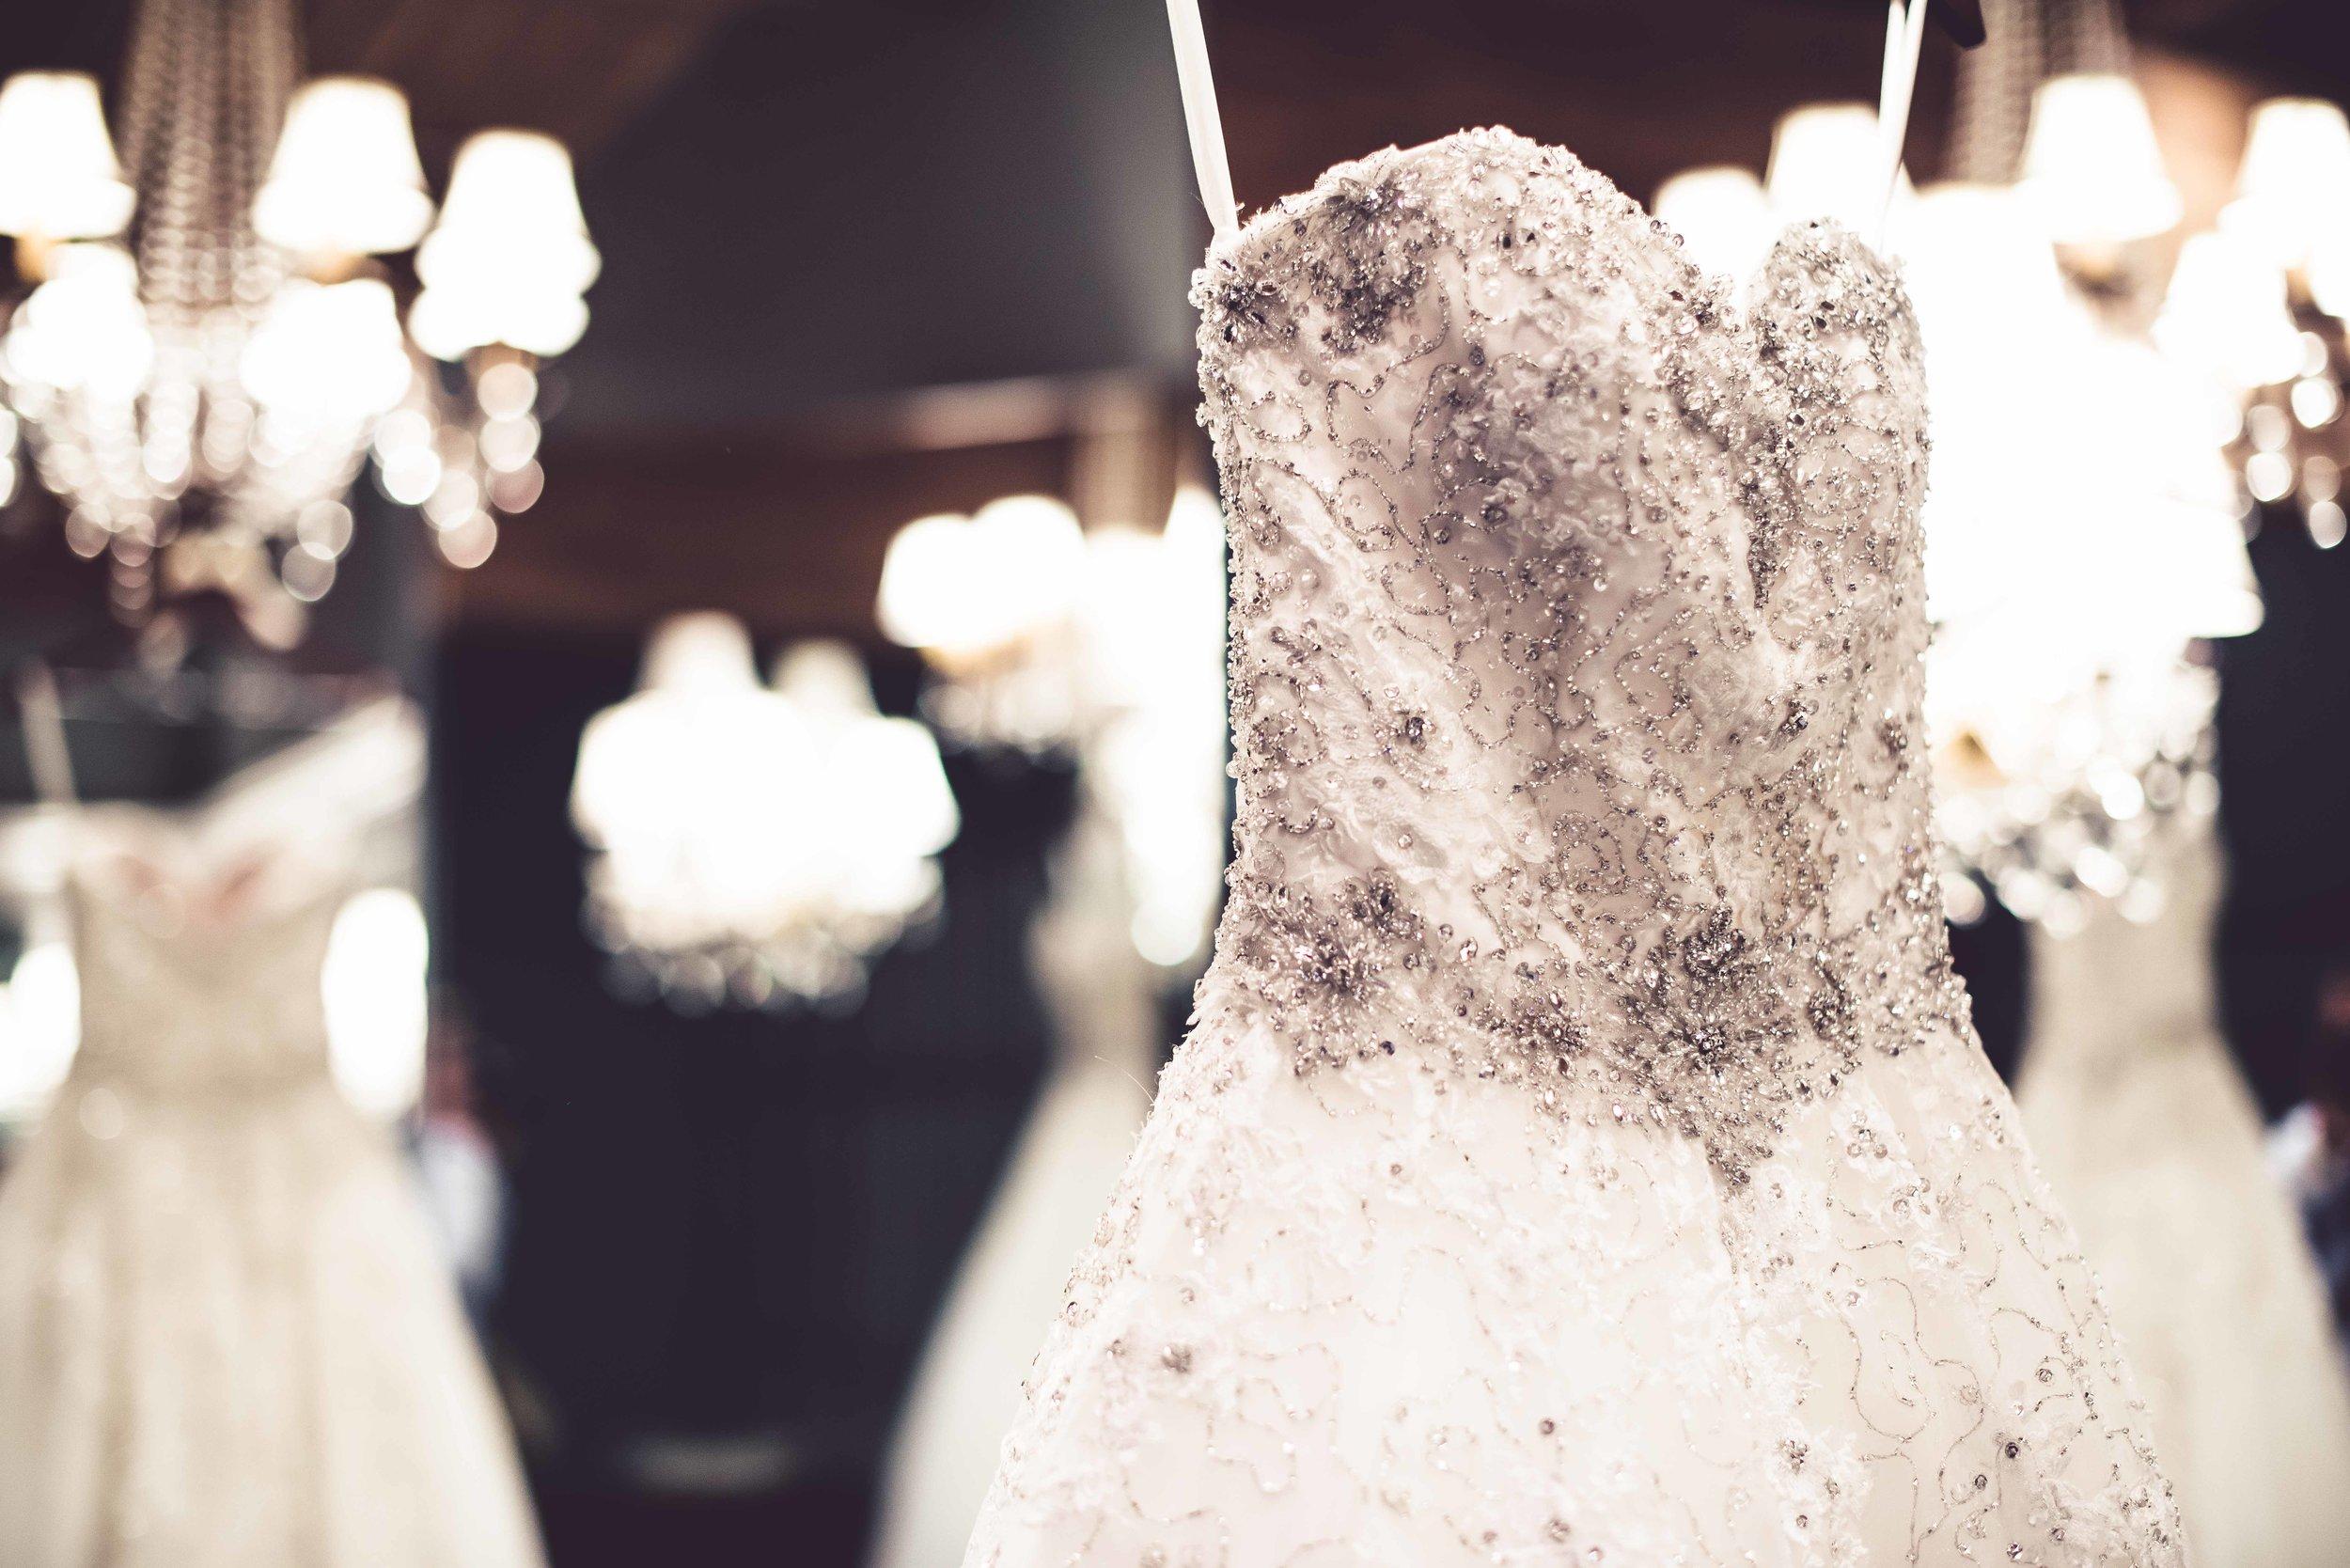 Minneapolis St Paul Twin Cities John Notman Wedding Engagement Best Candid Documentary Photography-3380.jpg